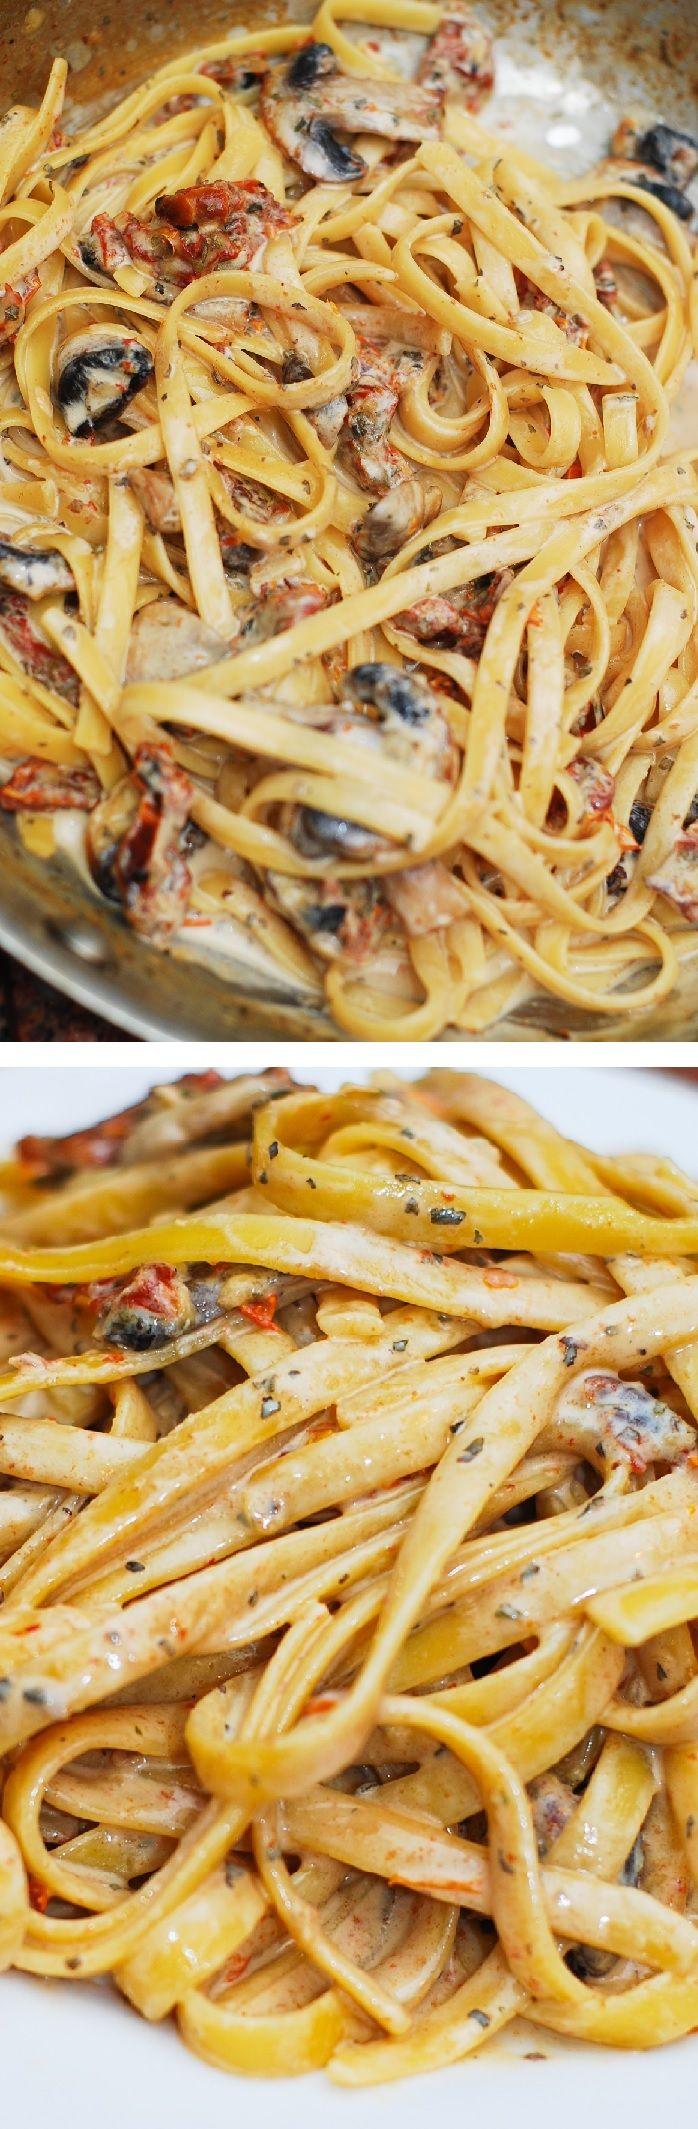 Sun dried tomato and mushroom pasta in a garlic and basil sauce - an Italian comfort food! @juliasalbum